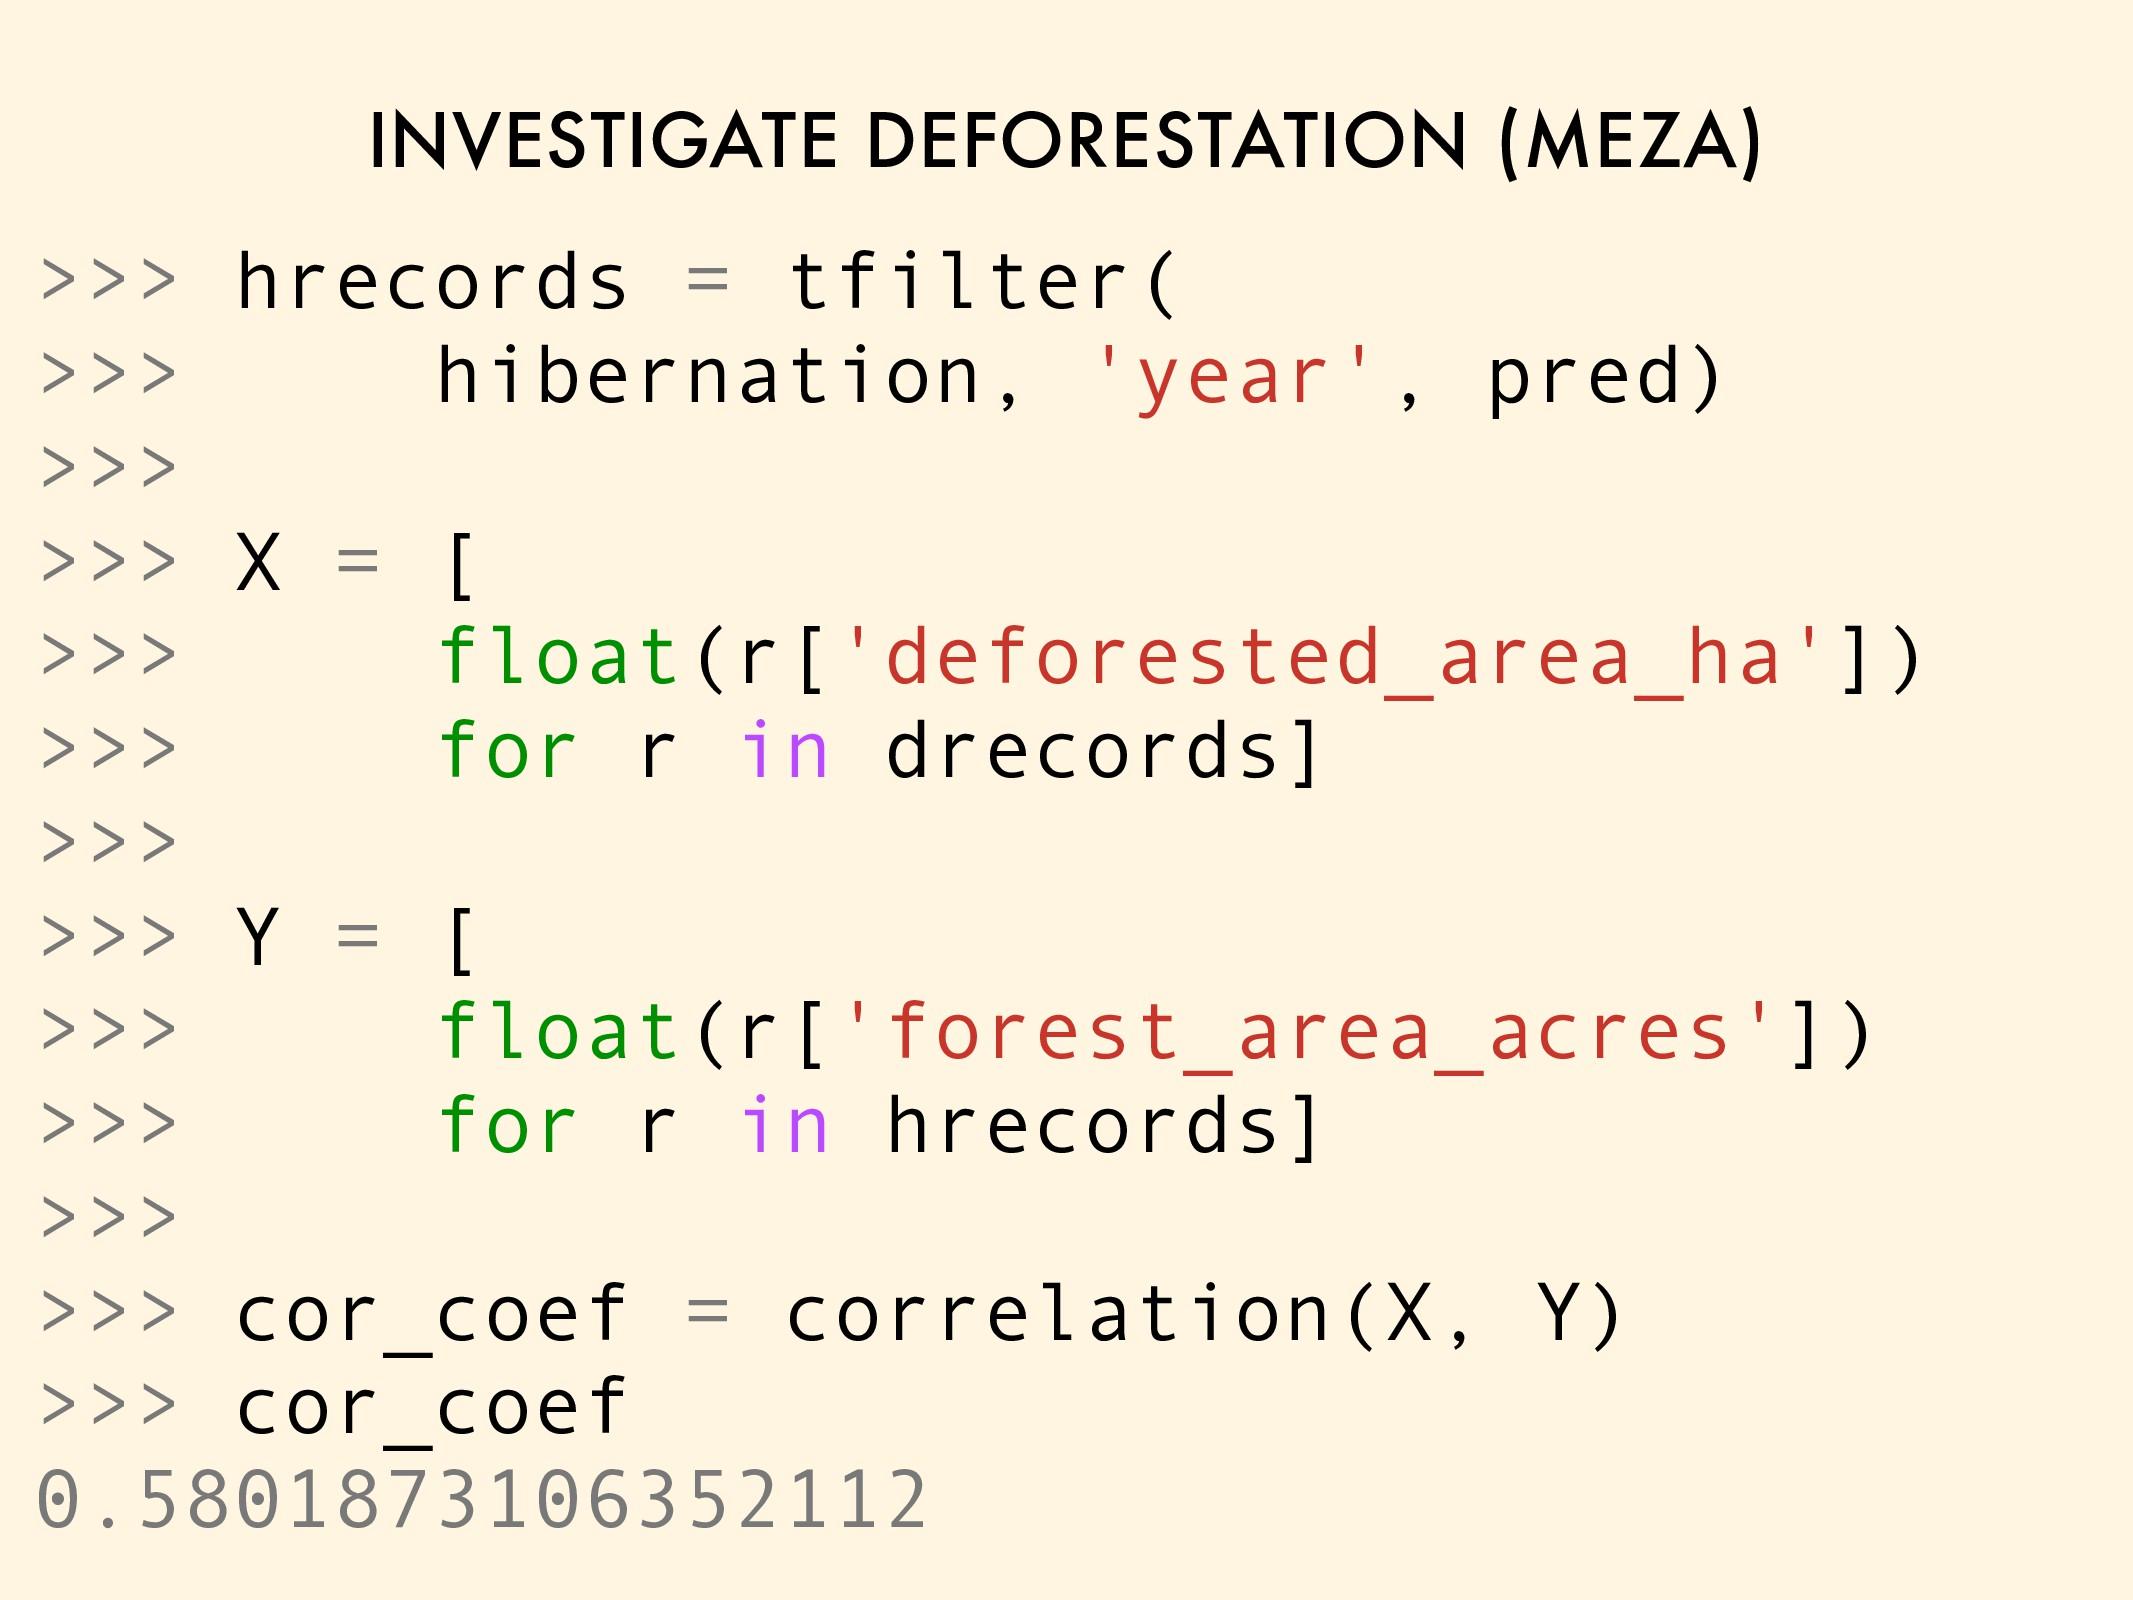 INVESTIGATE DEFORESTATION (MEZA) >>> hrecords =...